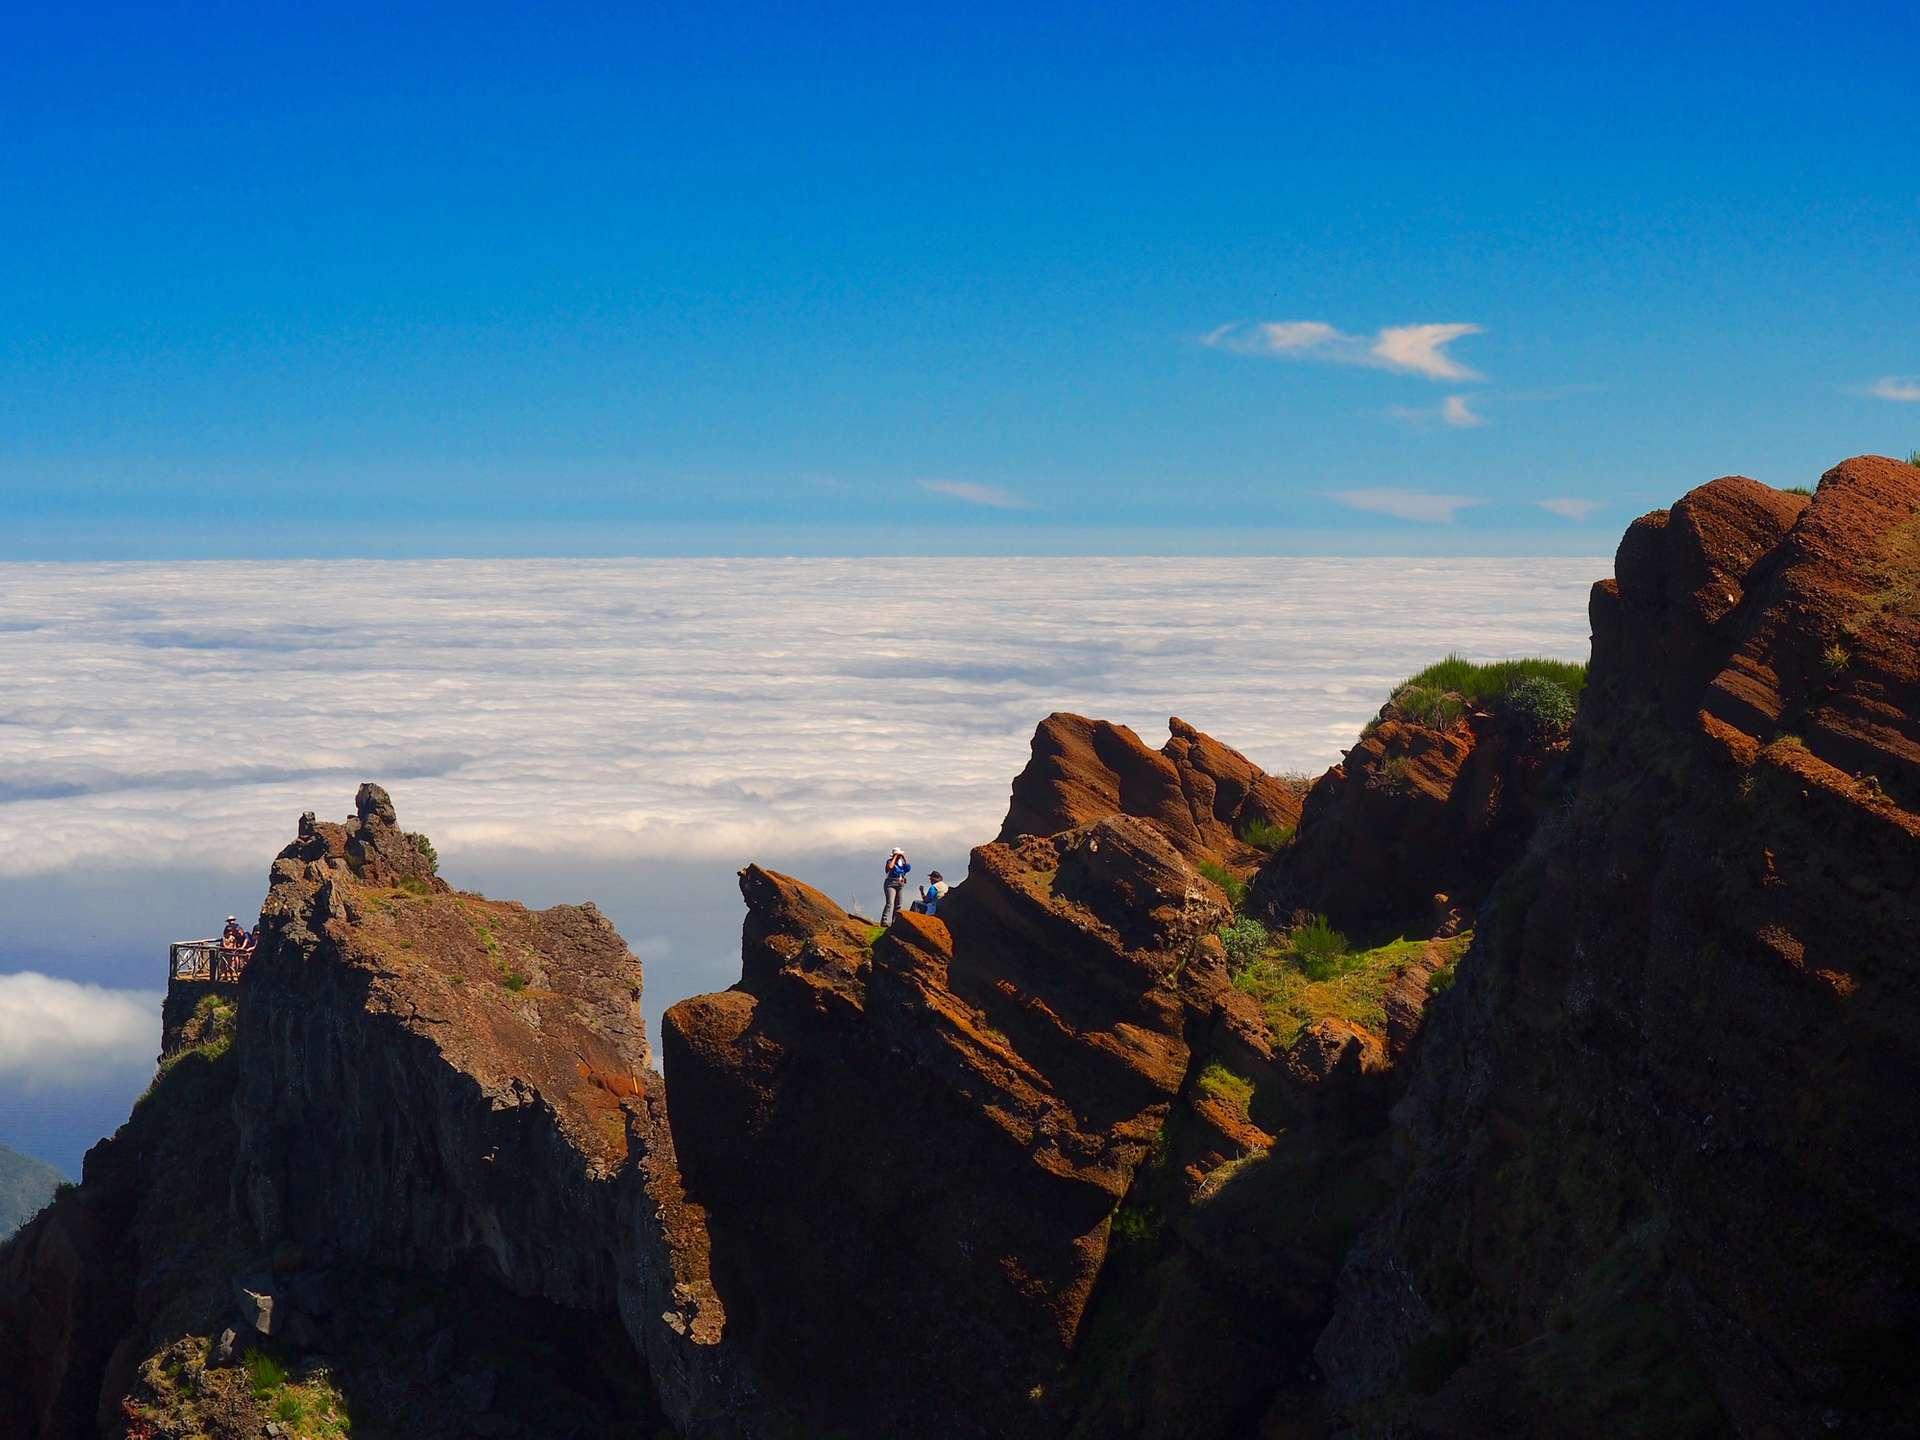 Pico Ruivo Madeira op 1800m hoogte!